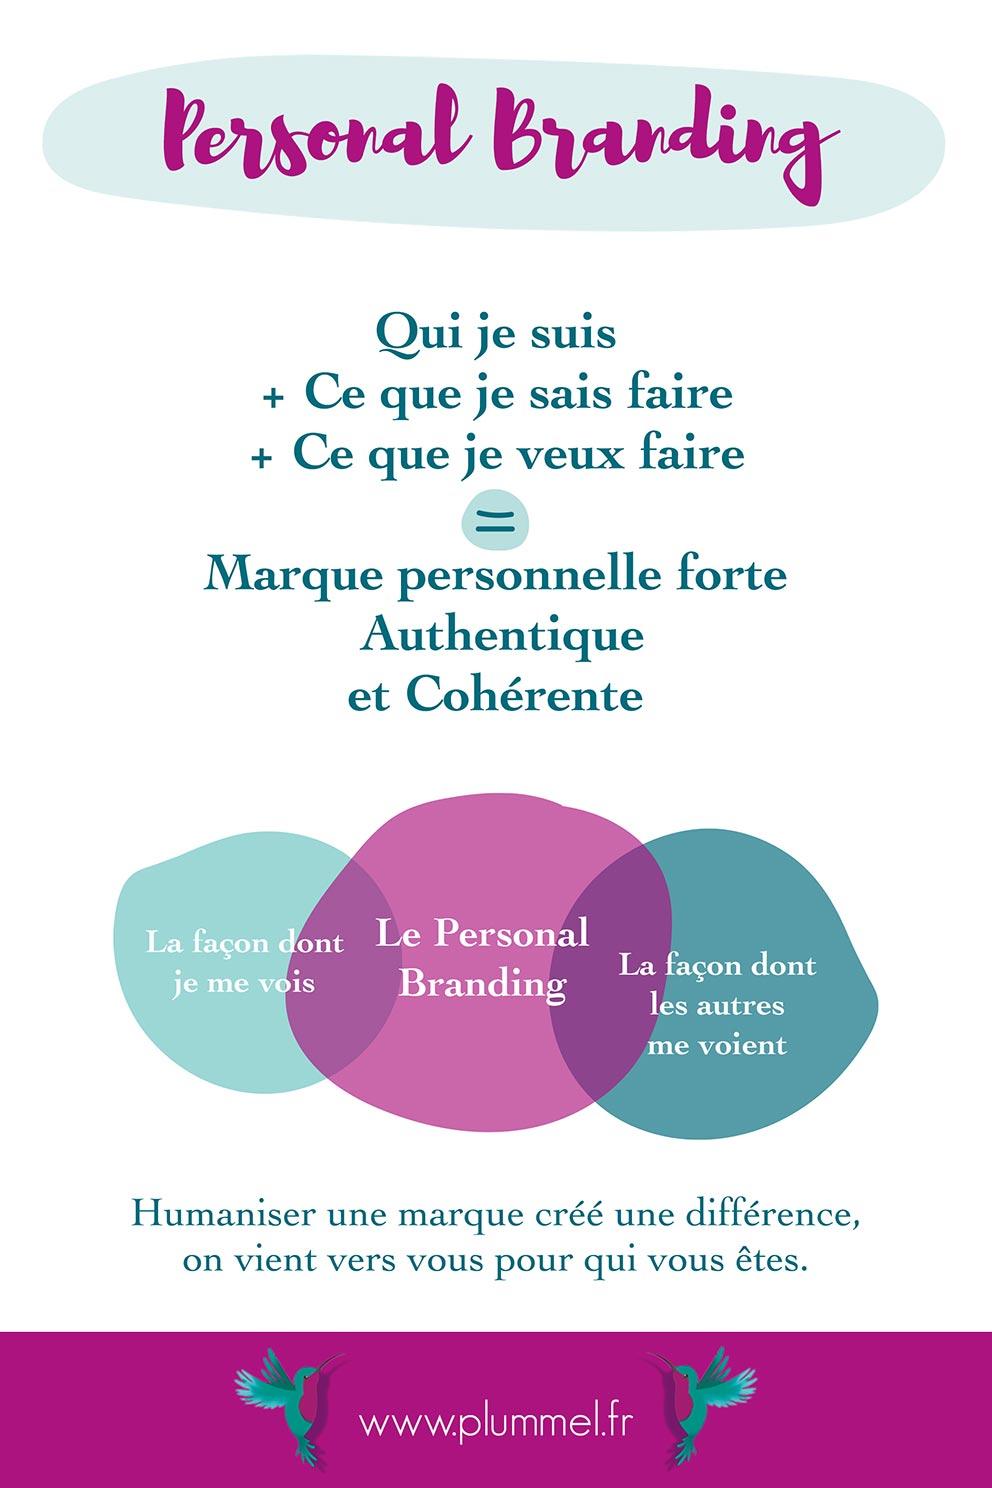 personal branding en bref